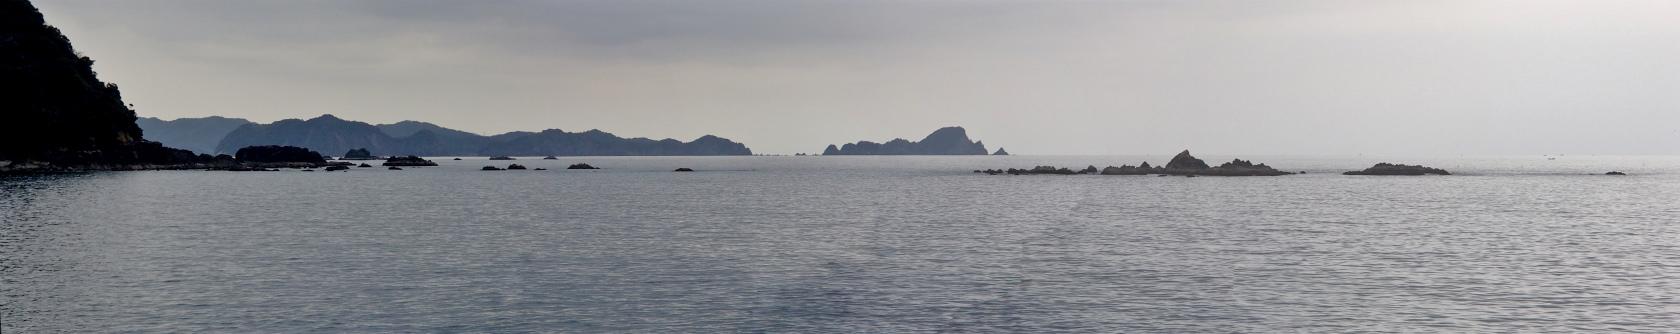 180303 futanajima (17)